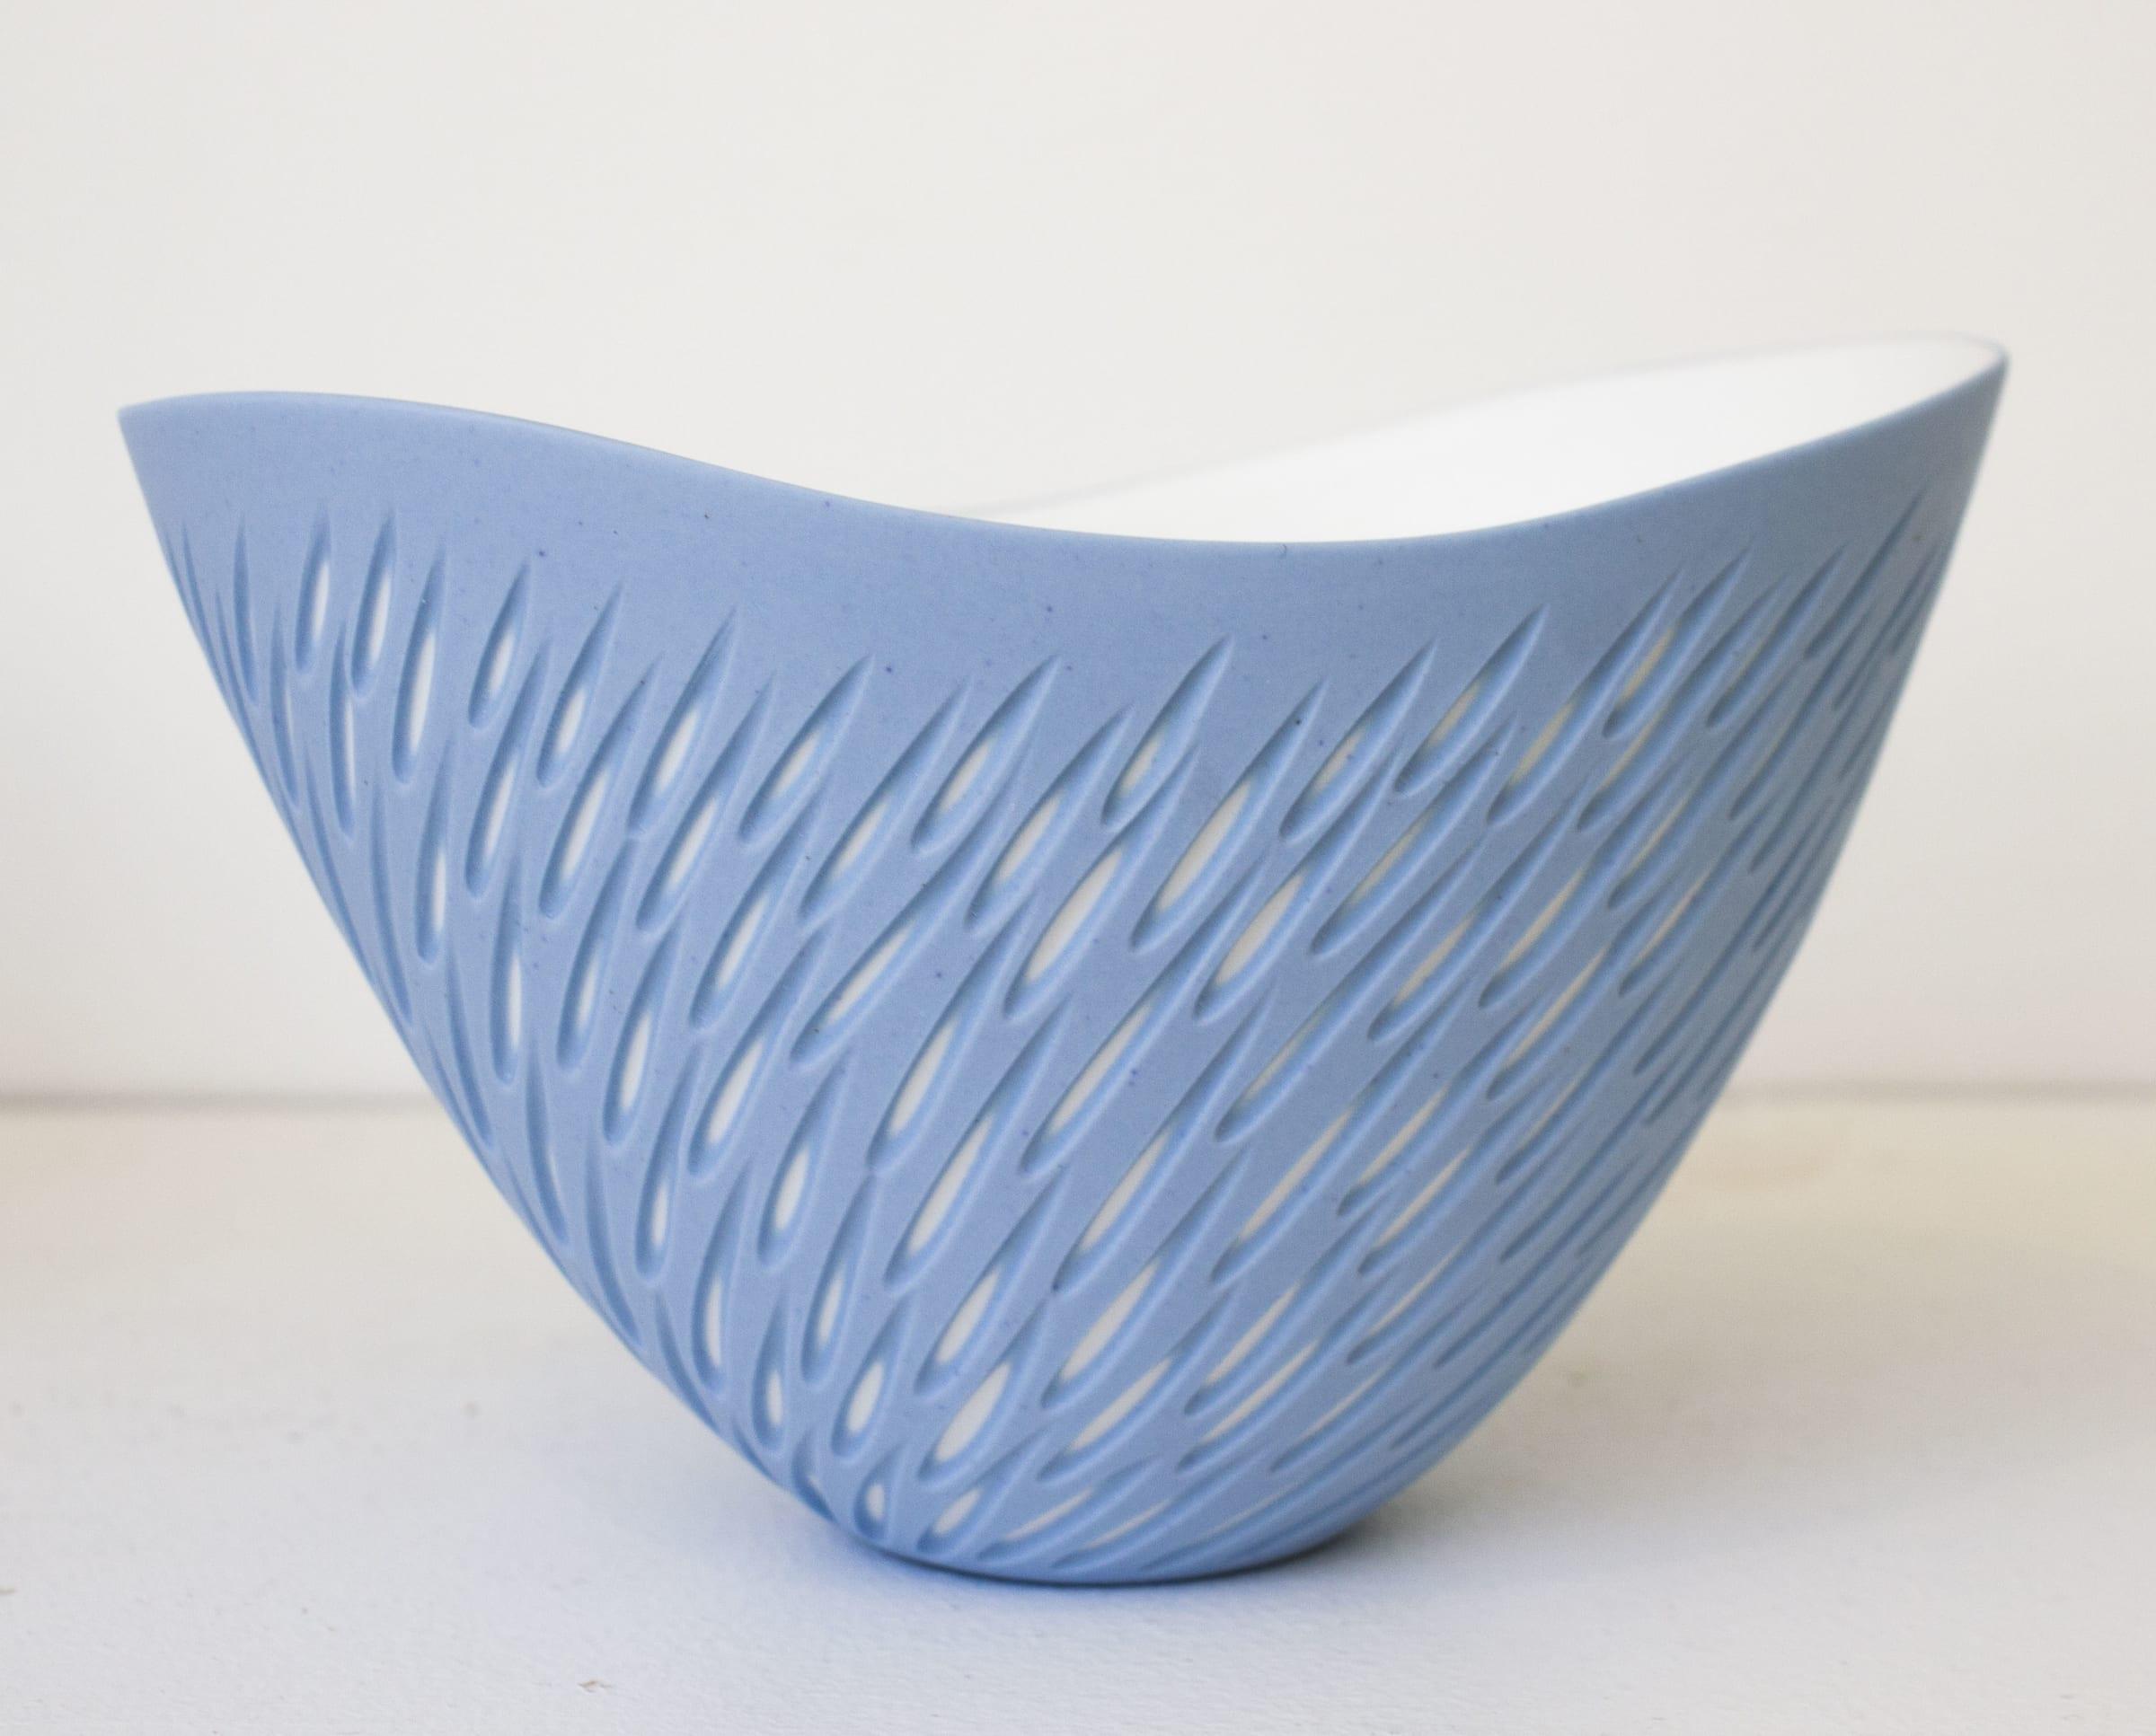 "<span class=""link fancybox-details-link""><a href=""/artists/60-sasha-wardell/works/7786-sasha-wardell-purple-shoal-curved-rim-bowl-2021/"">View Detail Page</a></span><div class=""artist""><strong>Sasha Wardell</strong></div> <div class=""title""><em>Purple 'Shoal' Curved Rim Bowl</em>, 2021</div> <div class=""medium"">bone china</div> <div class=""dimensions"">h. 11 cm</div><div class=""price"">£180.00</div><div class=""copyright_line"">Own Art: £18 x 10 Months, 0% APR</div>"